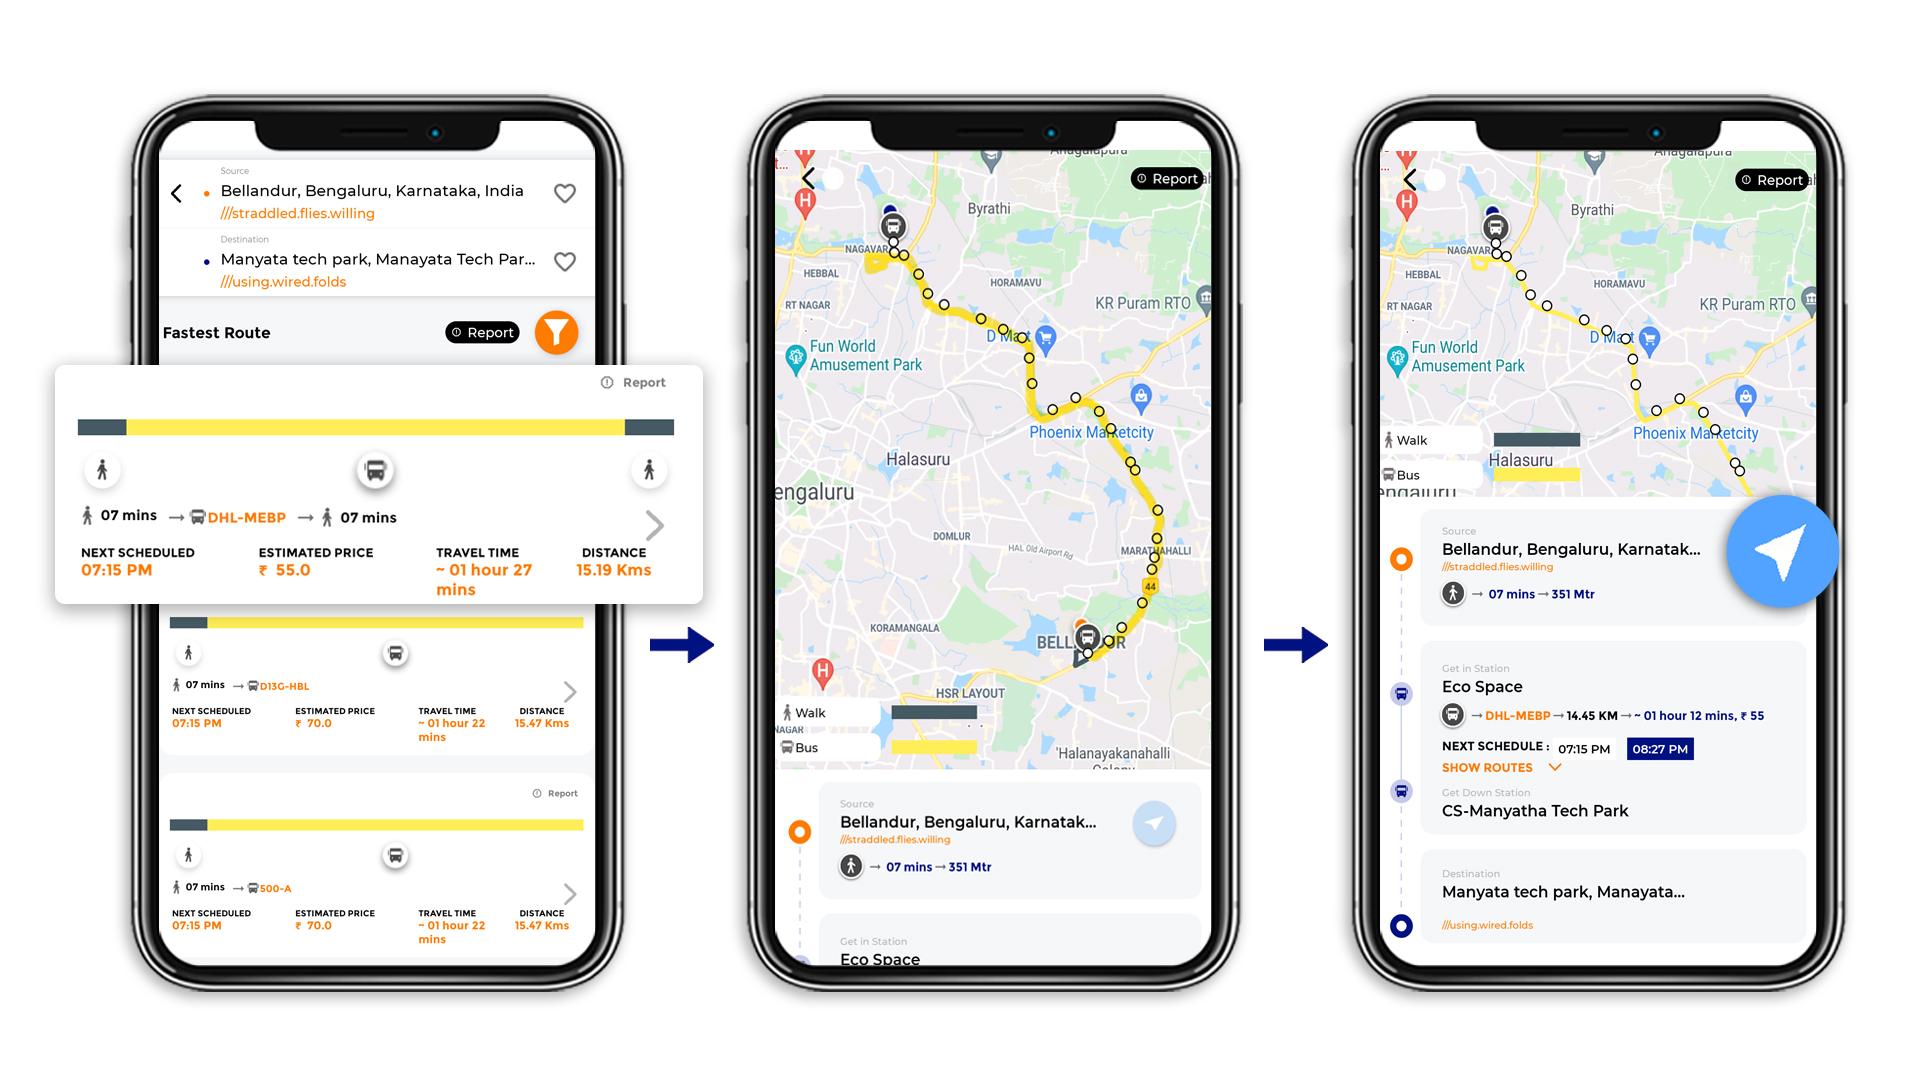 Tummoc, Tummoc app, Bellandur, Manyata Tech park, Public transport